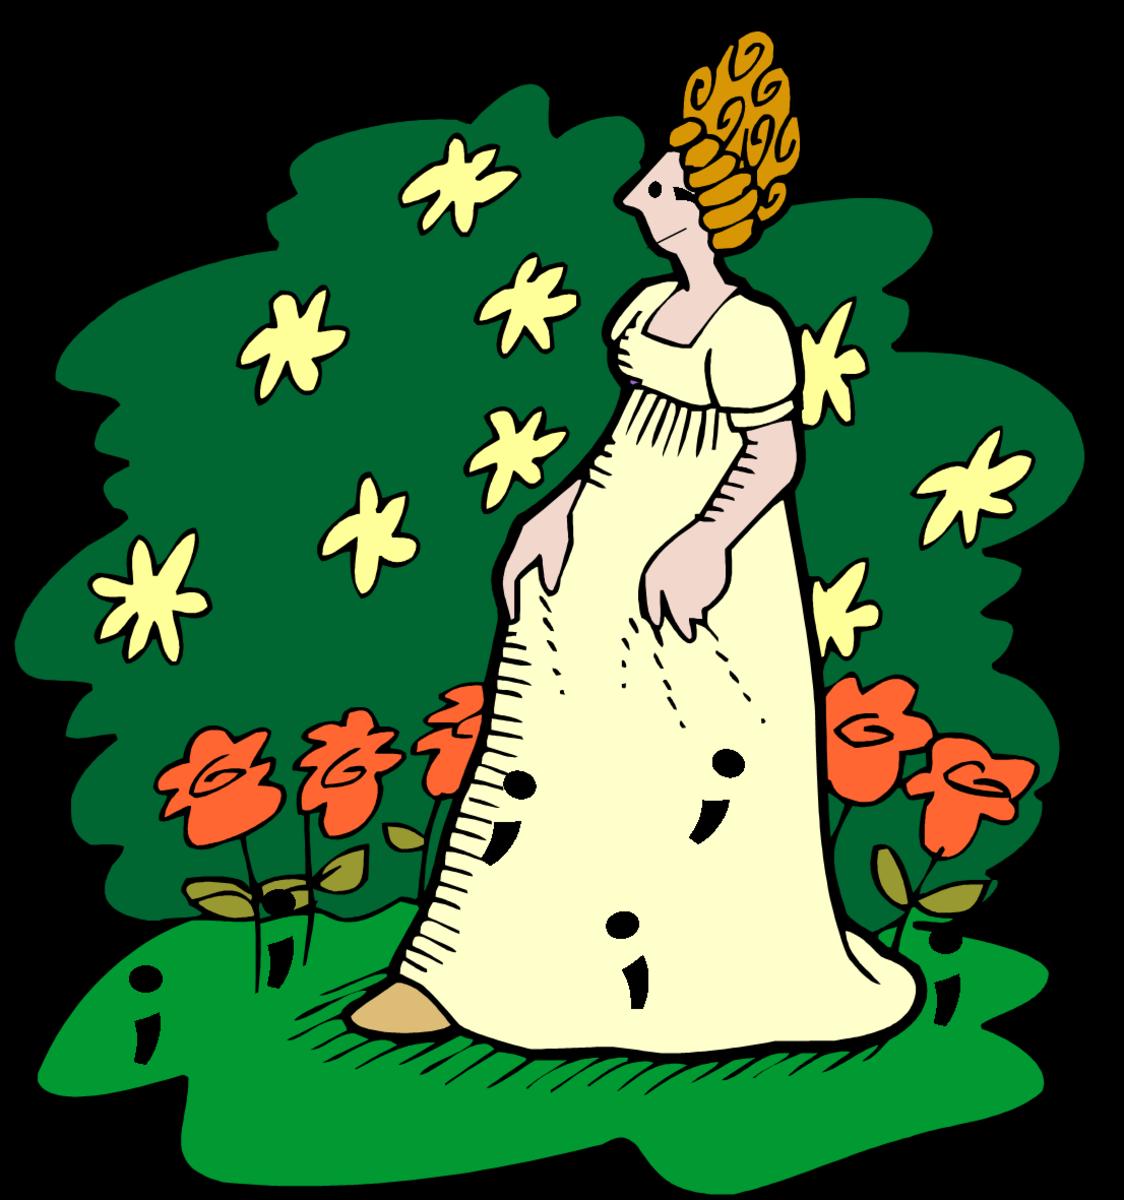 Lady Semicolon - Snooty and Sassy